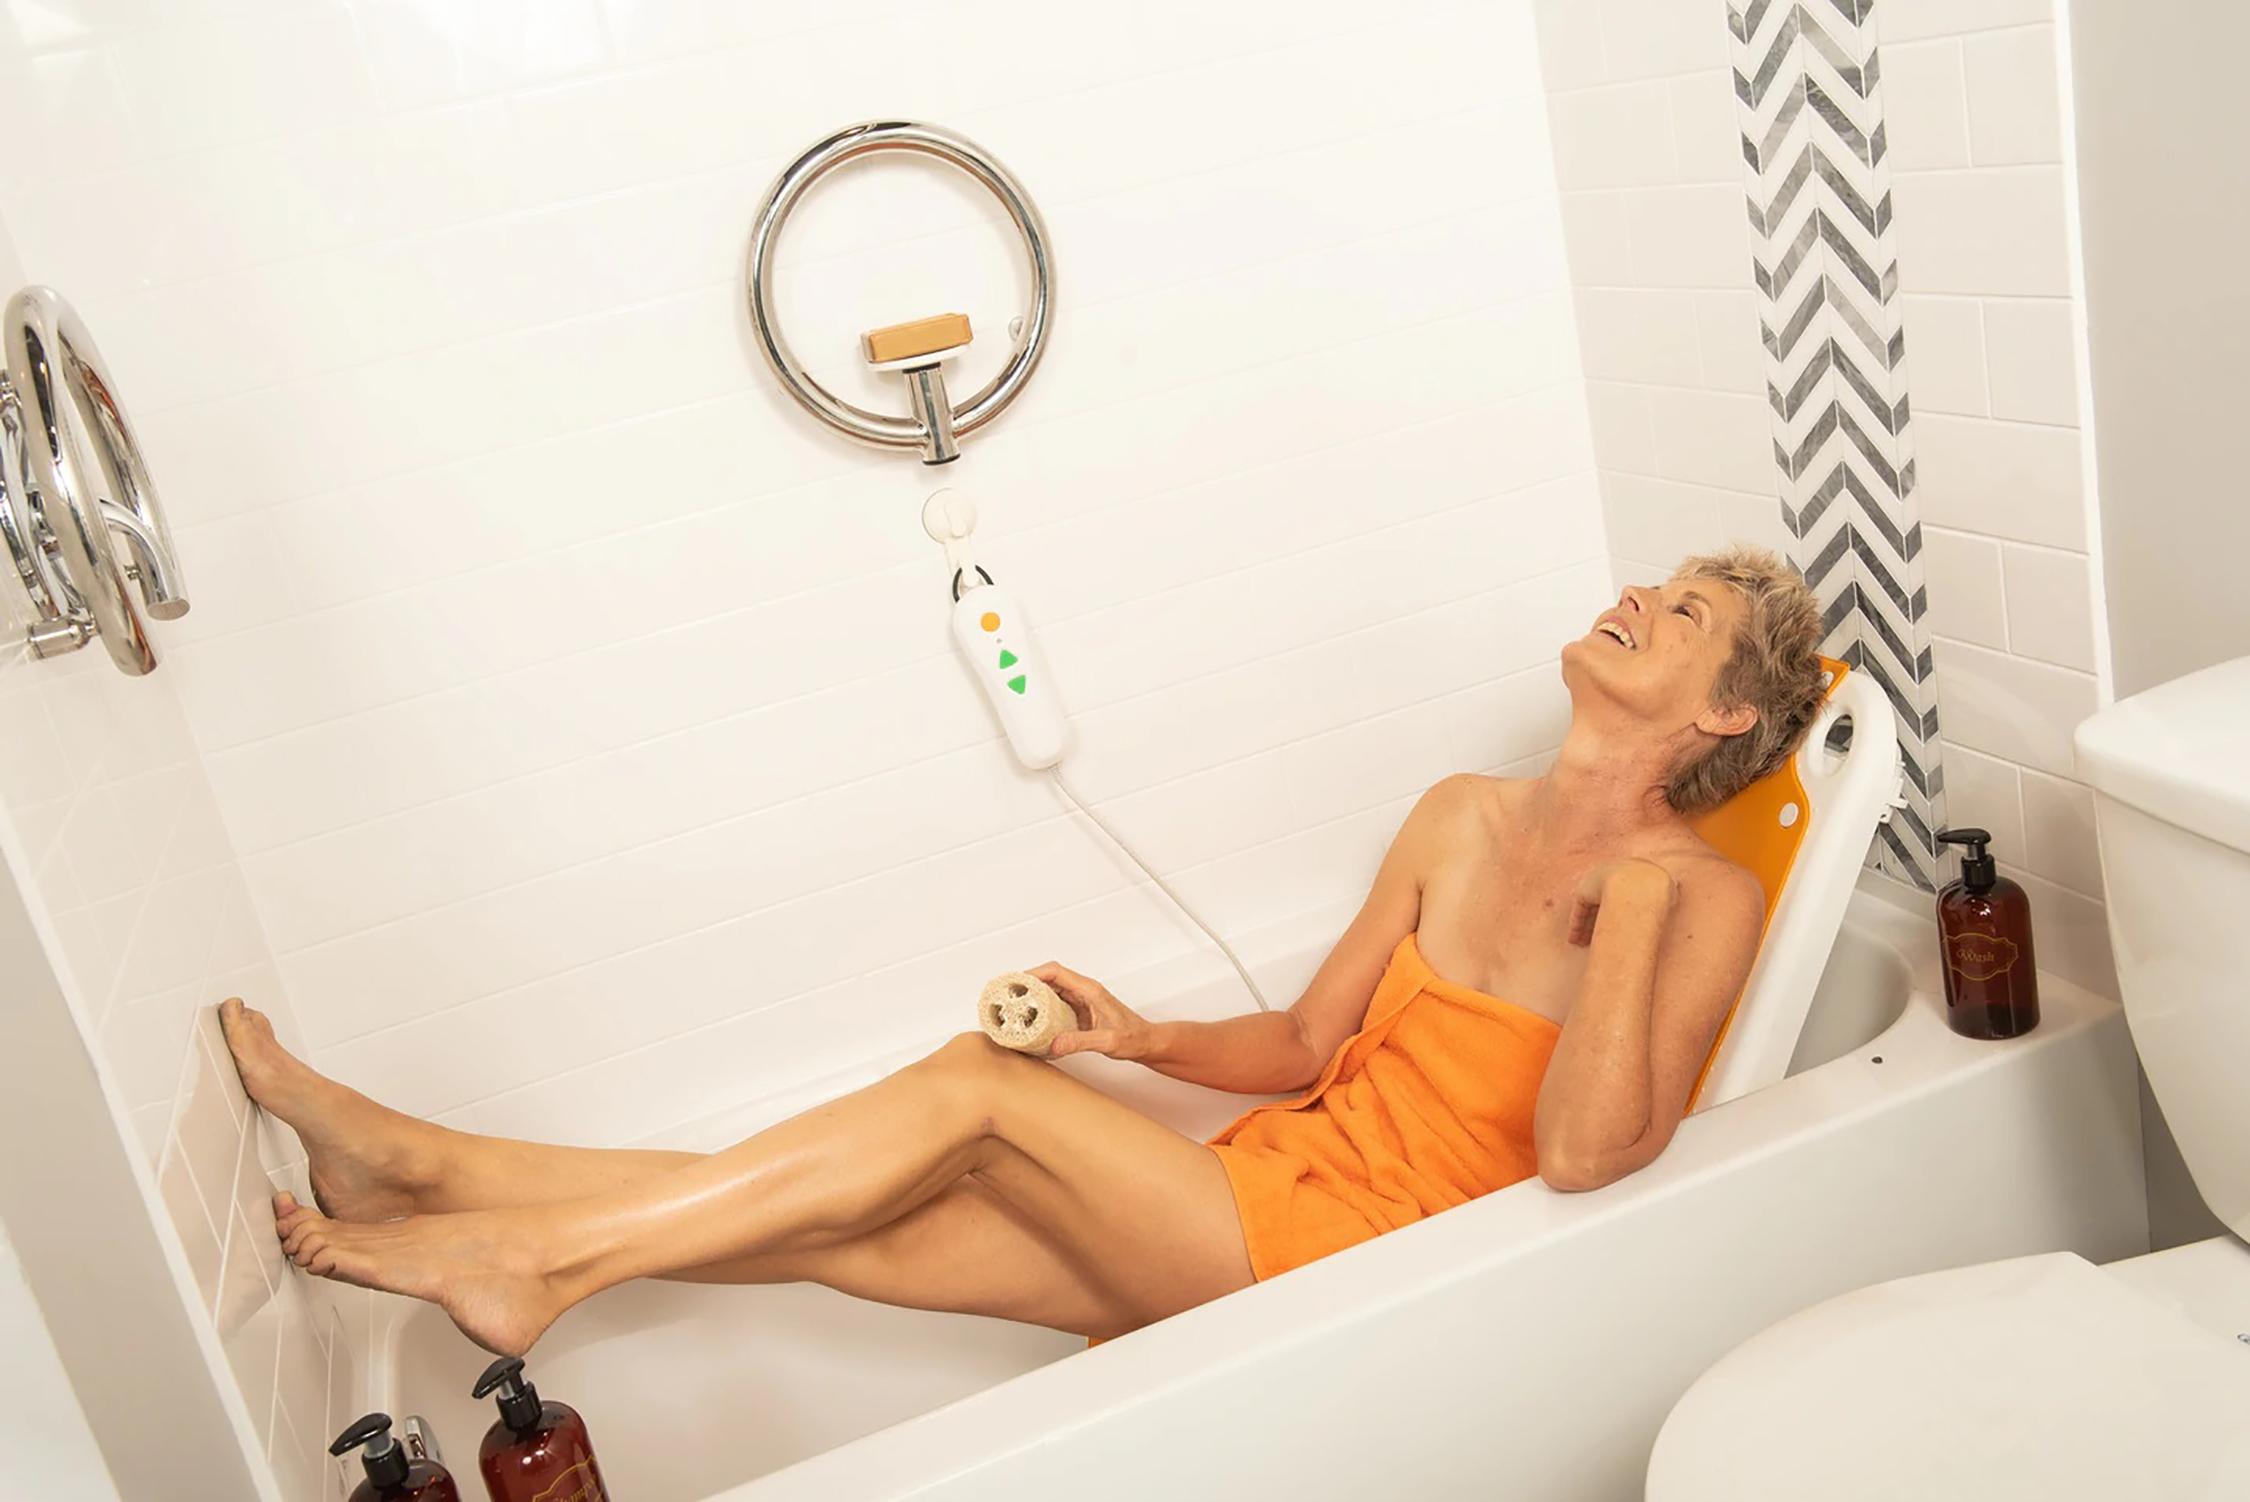 Bath Lyft For The Bath | Michigan USA The Bath Lyft For The Bath may be your solution getting into the Bath tub.